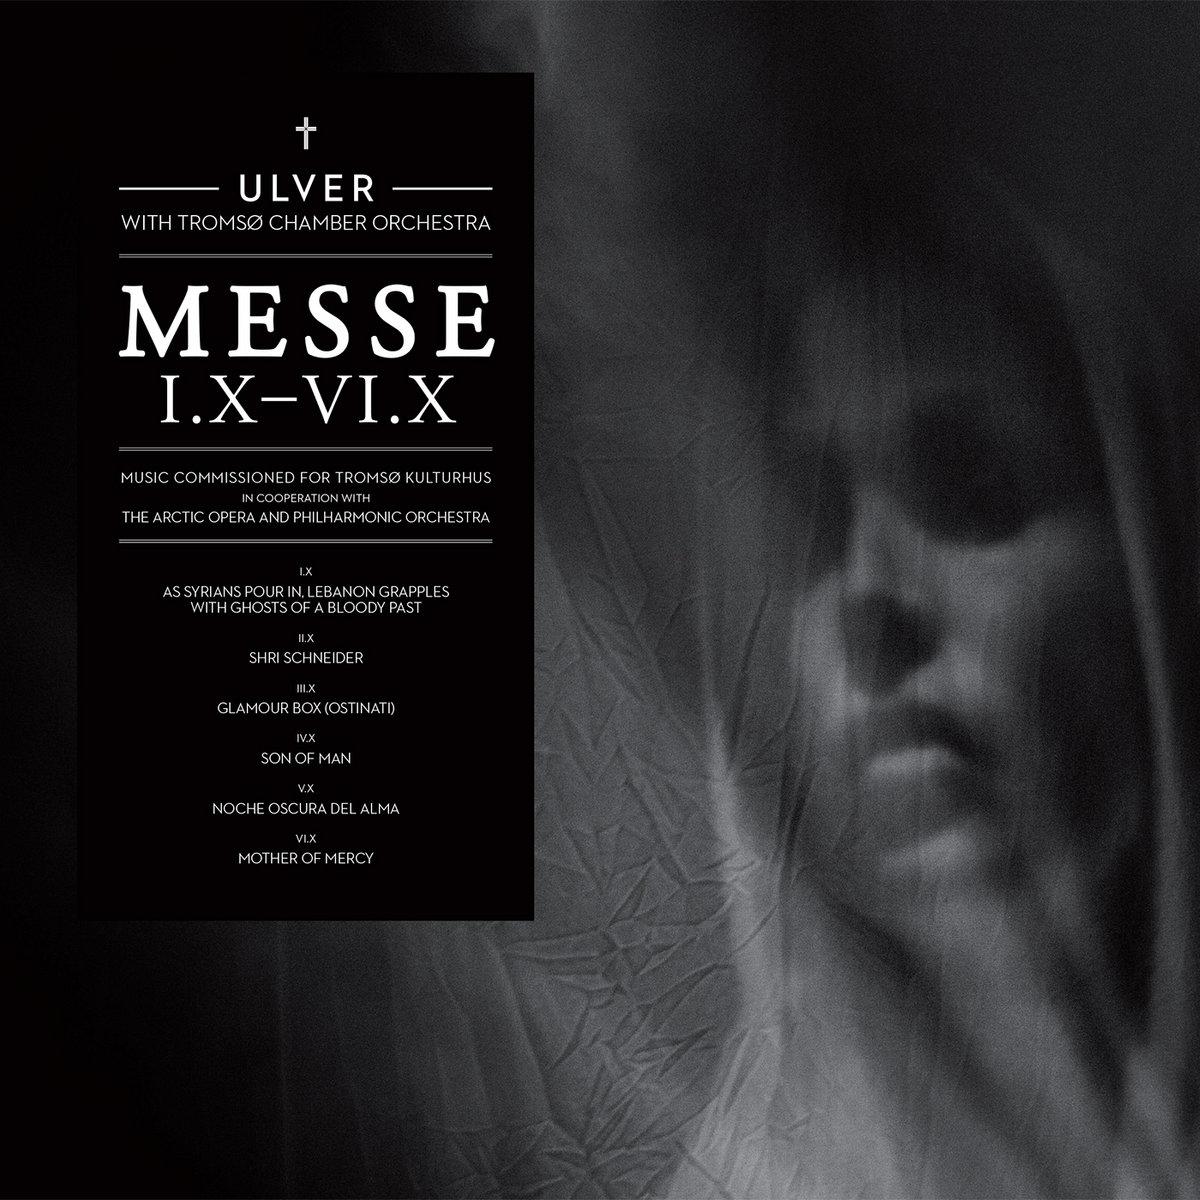 Ulver - Messe I.X-VI.X (2013)